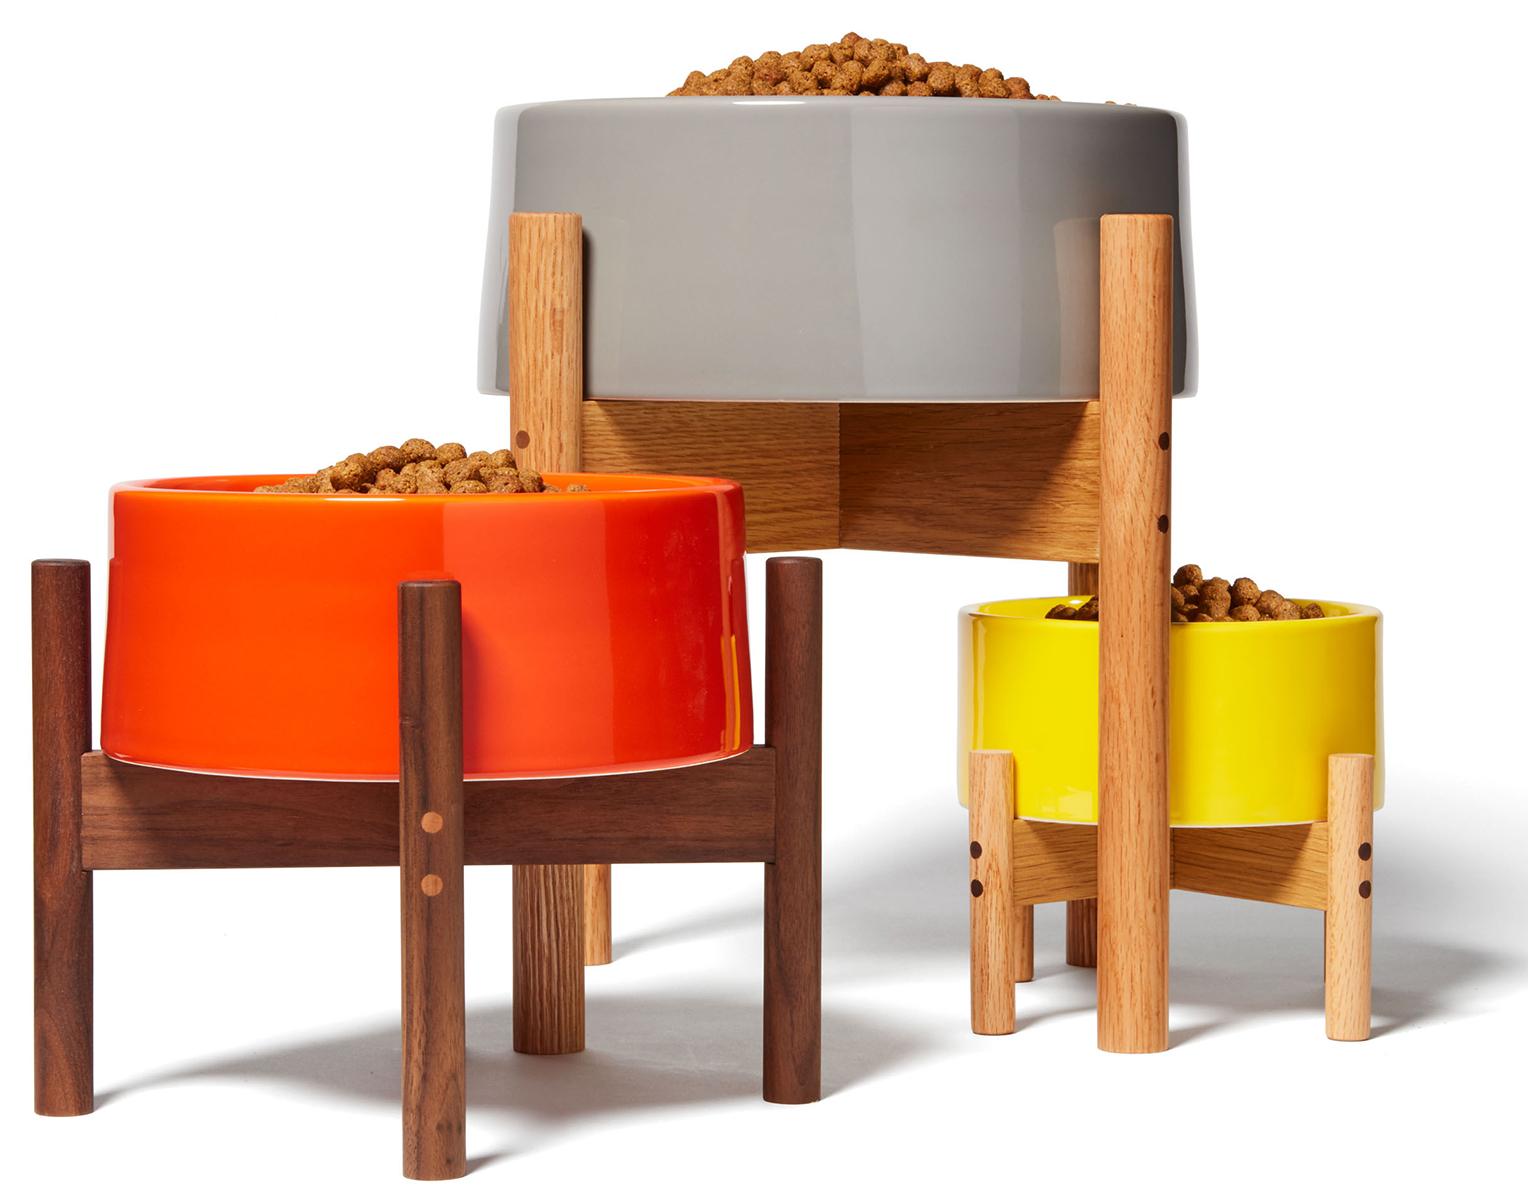 Mr. Dog All-Purpose Dog Bowl & Stand